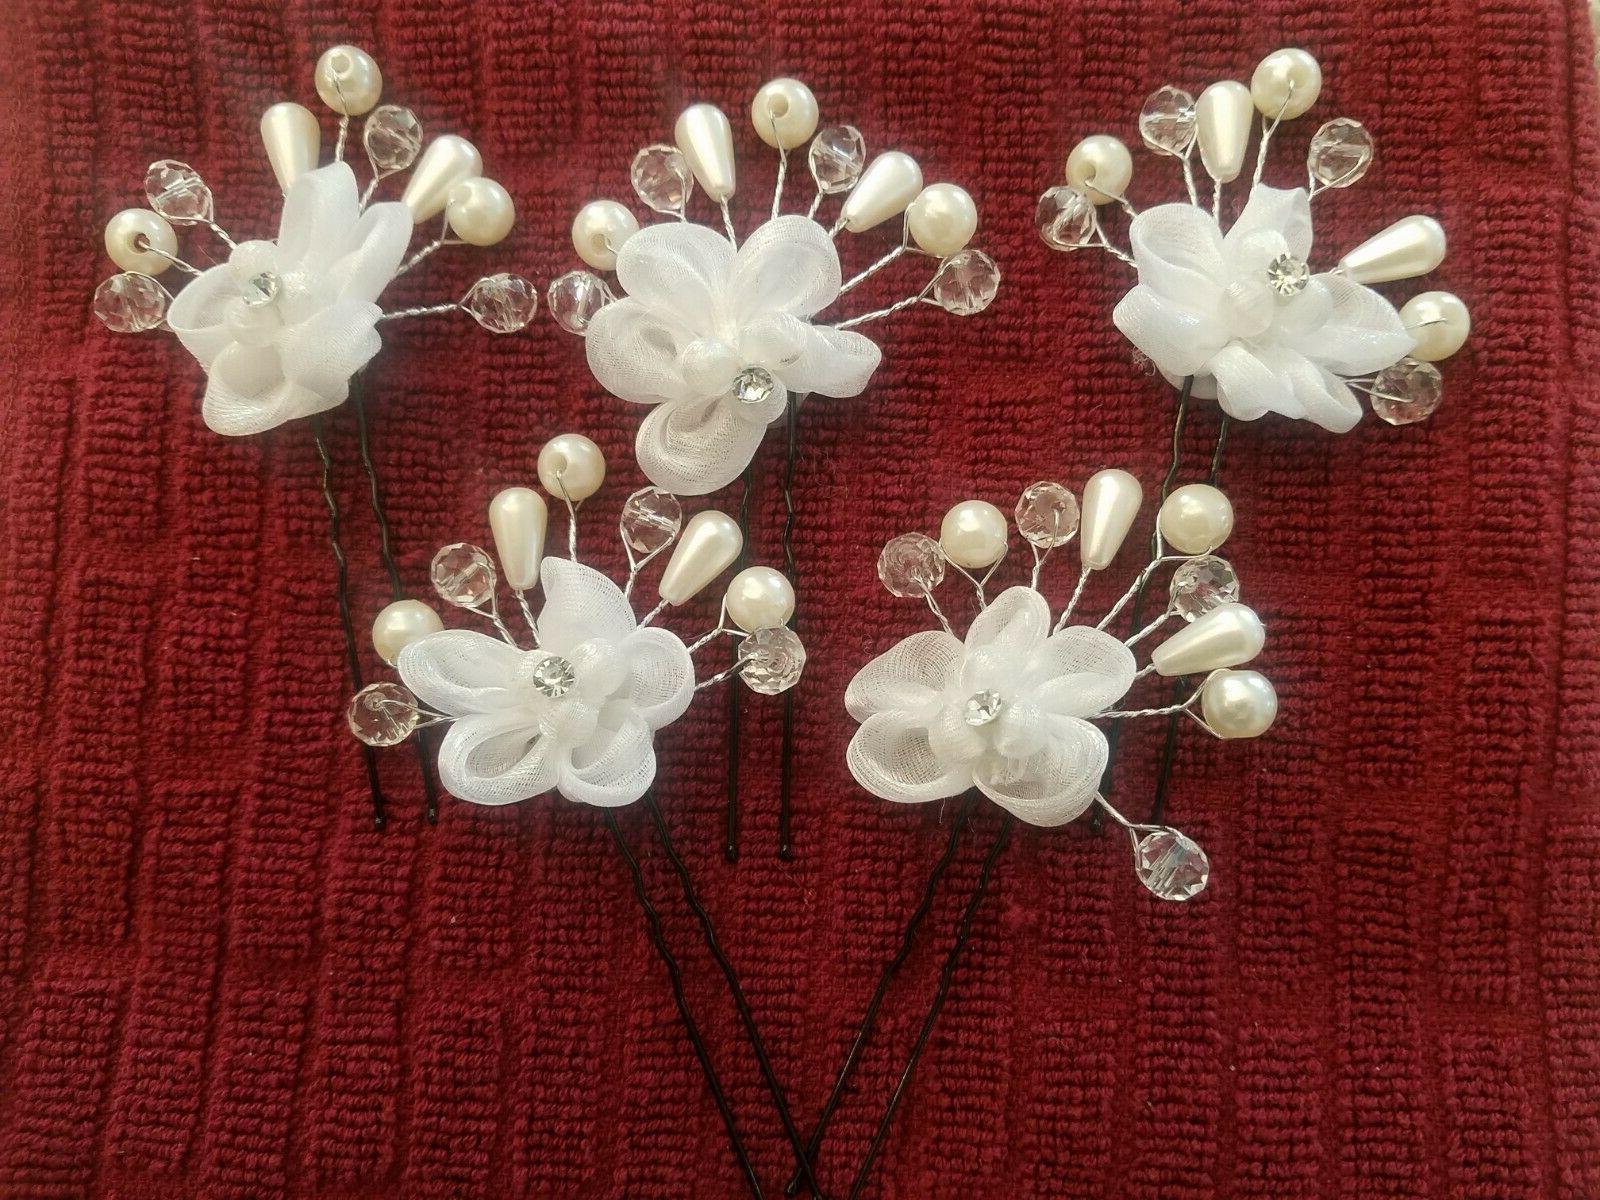 Wedding Floral Pearl Hair Clip Hairpin Accessories USA